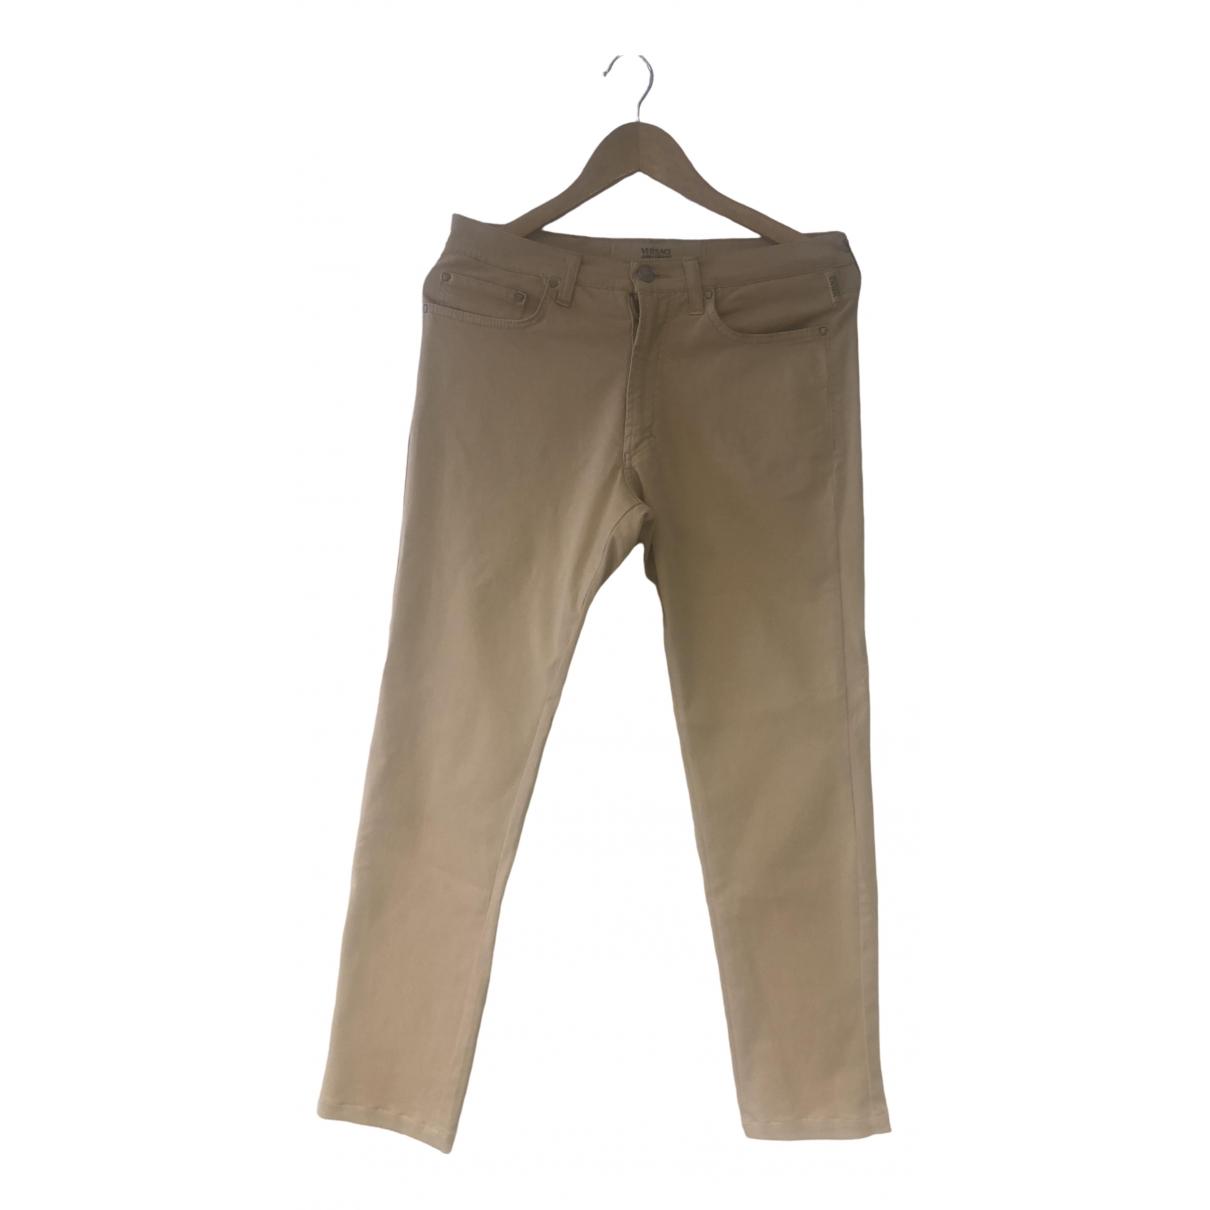 Versace Jeans \N Beige Cotton Trousers for Men 46 IT